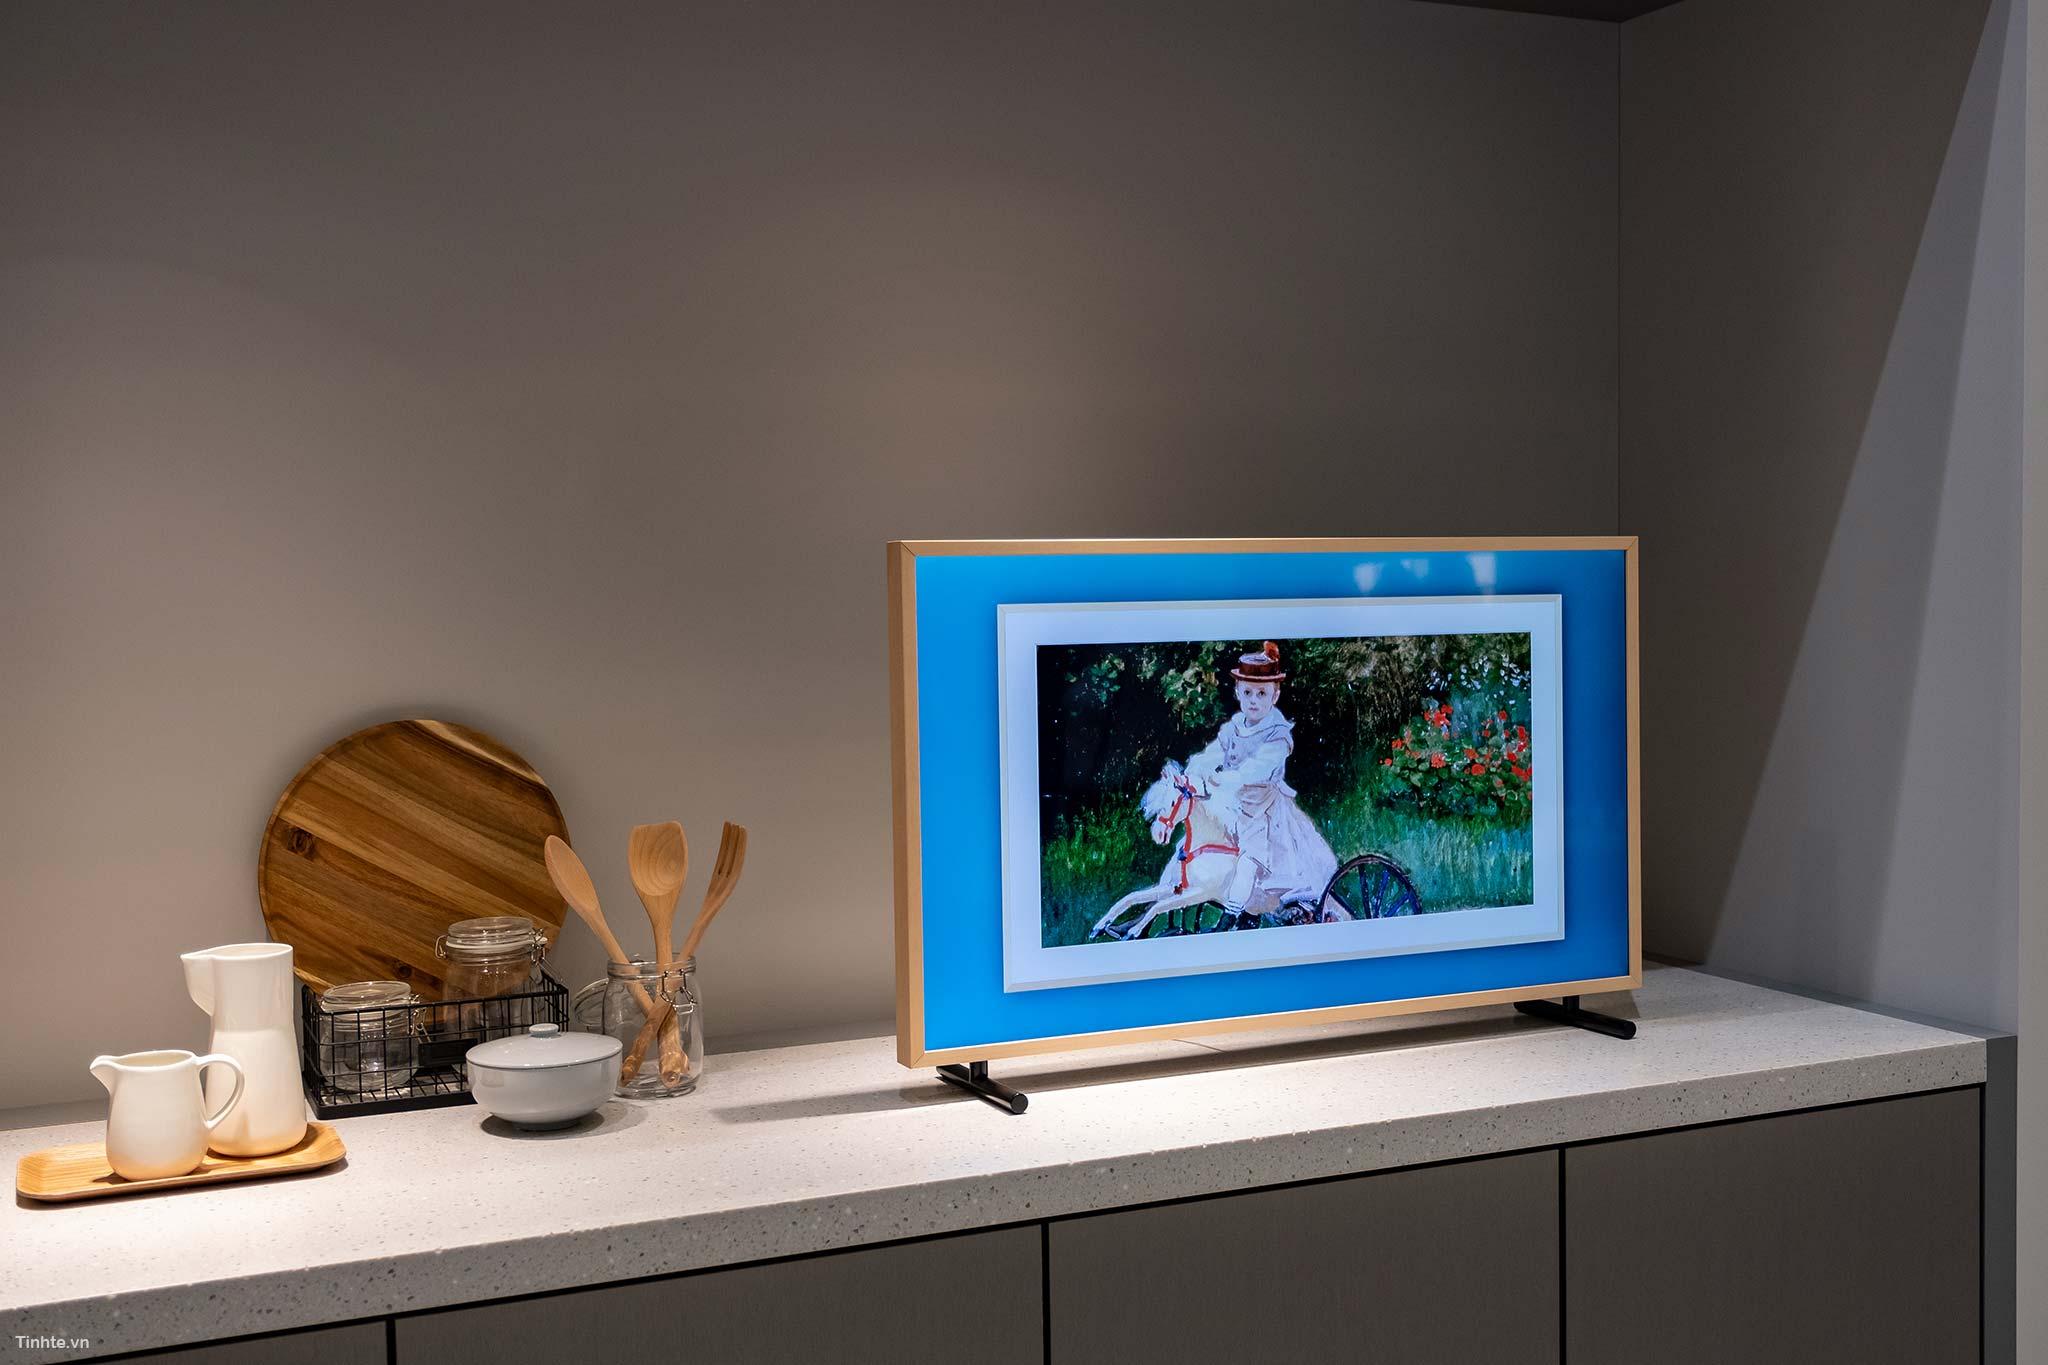 Samsung_The_Frame-14.jpg